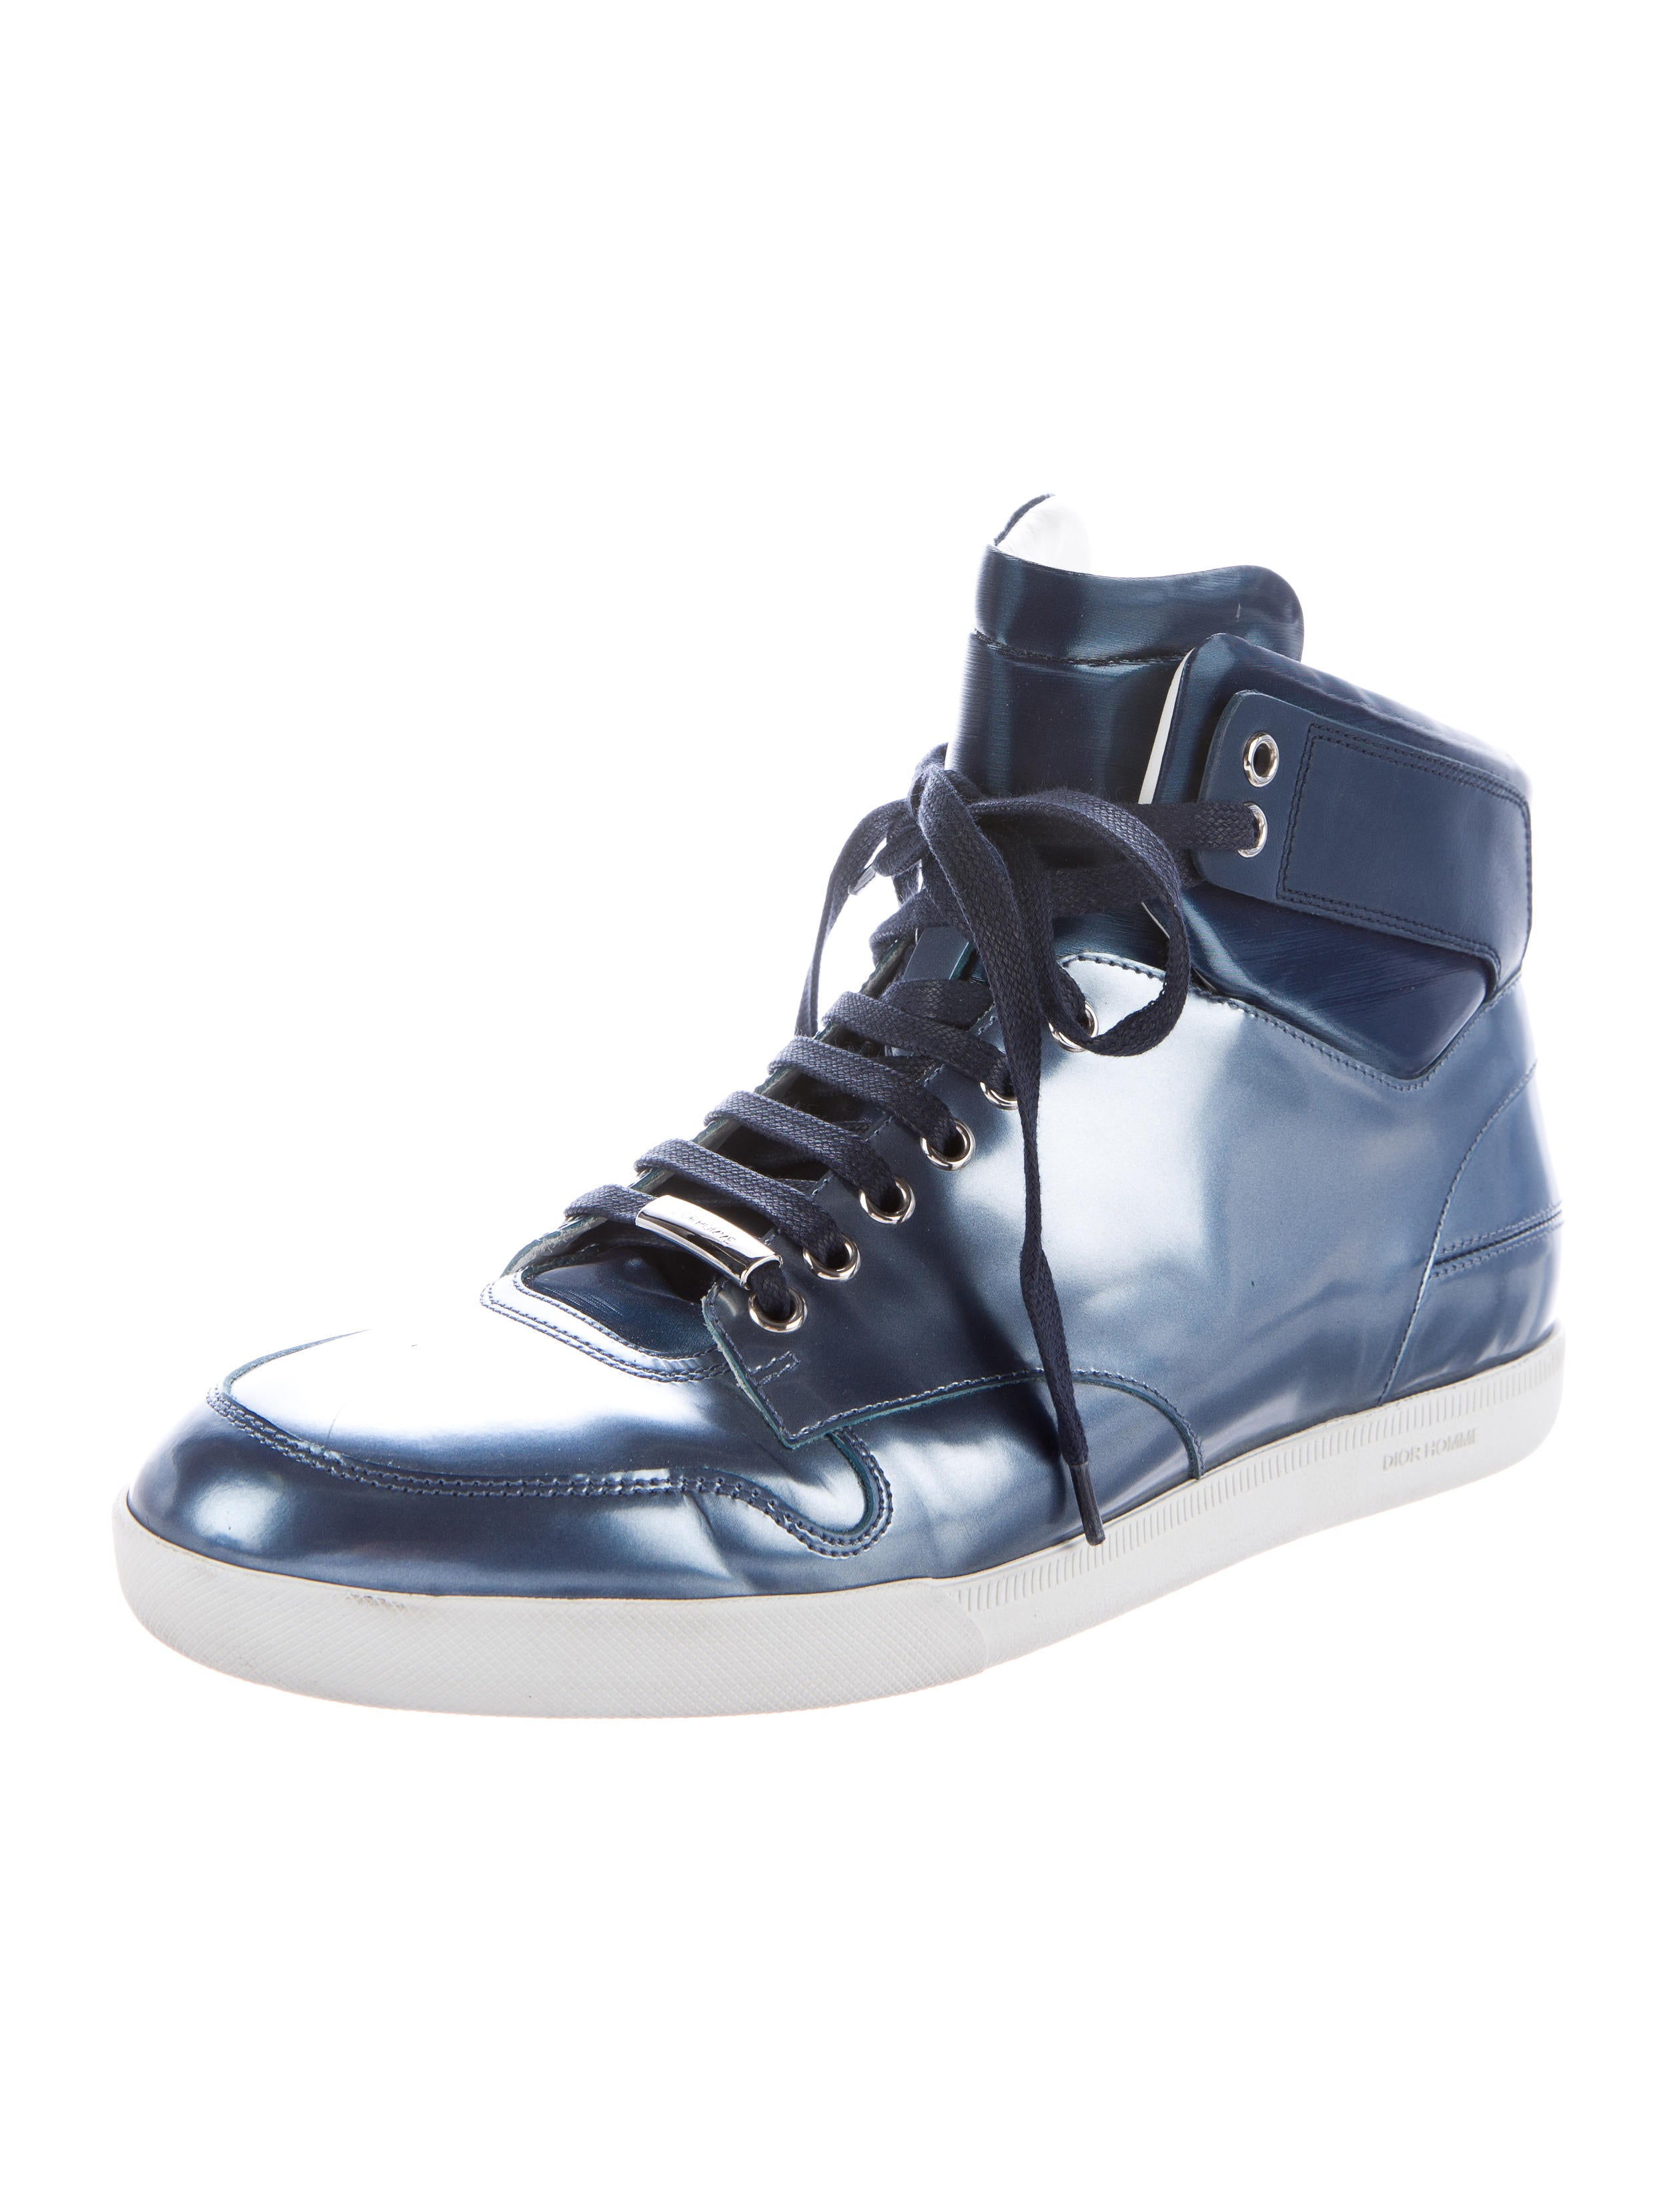 Dior Homme Metallic High-Top Sneakers - 369.8KB